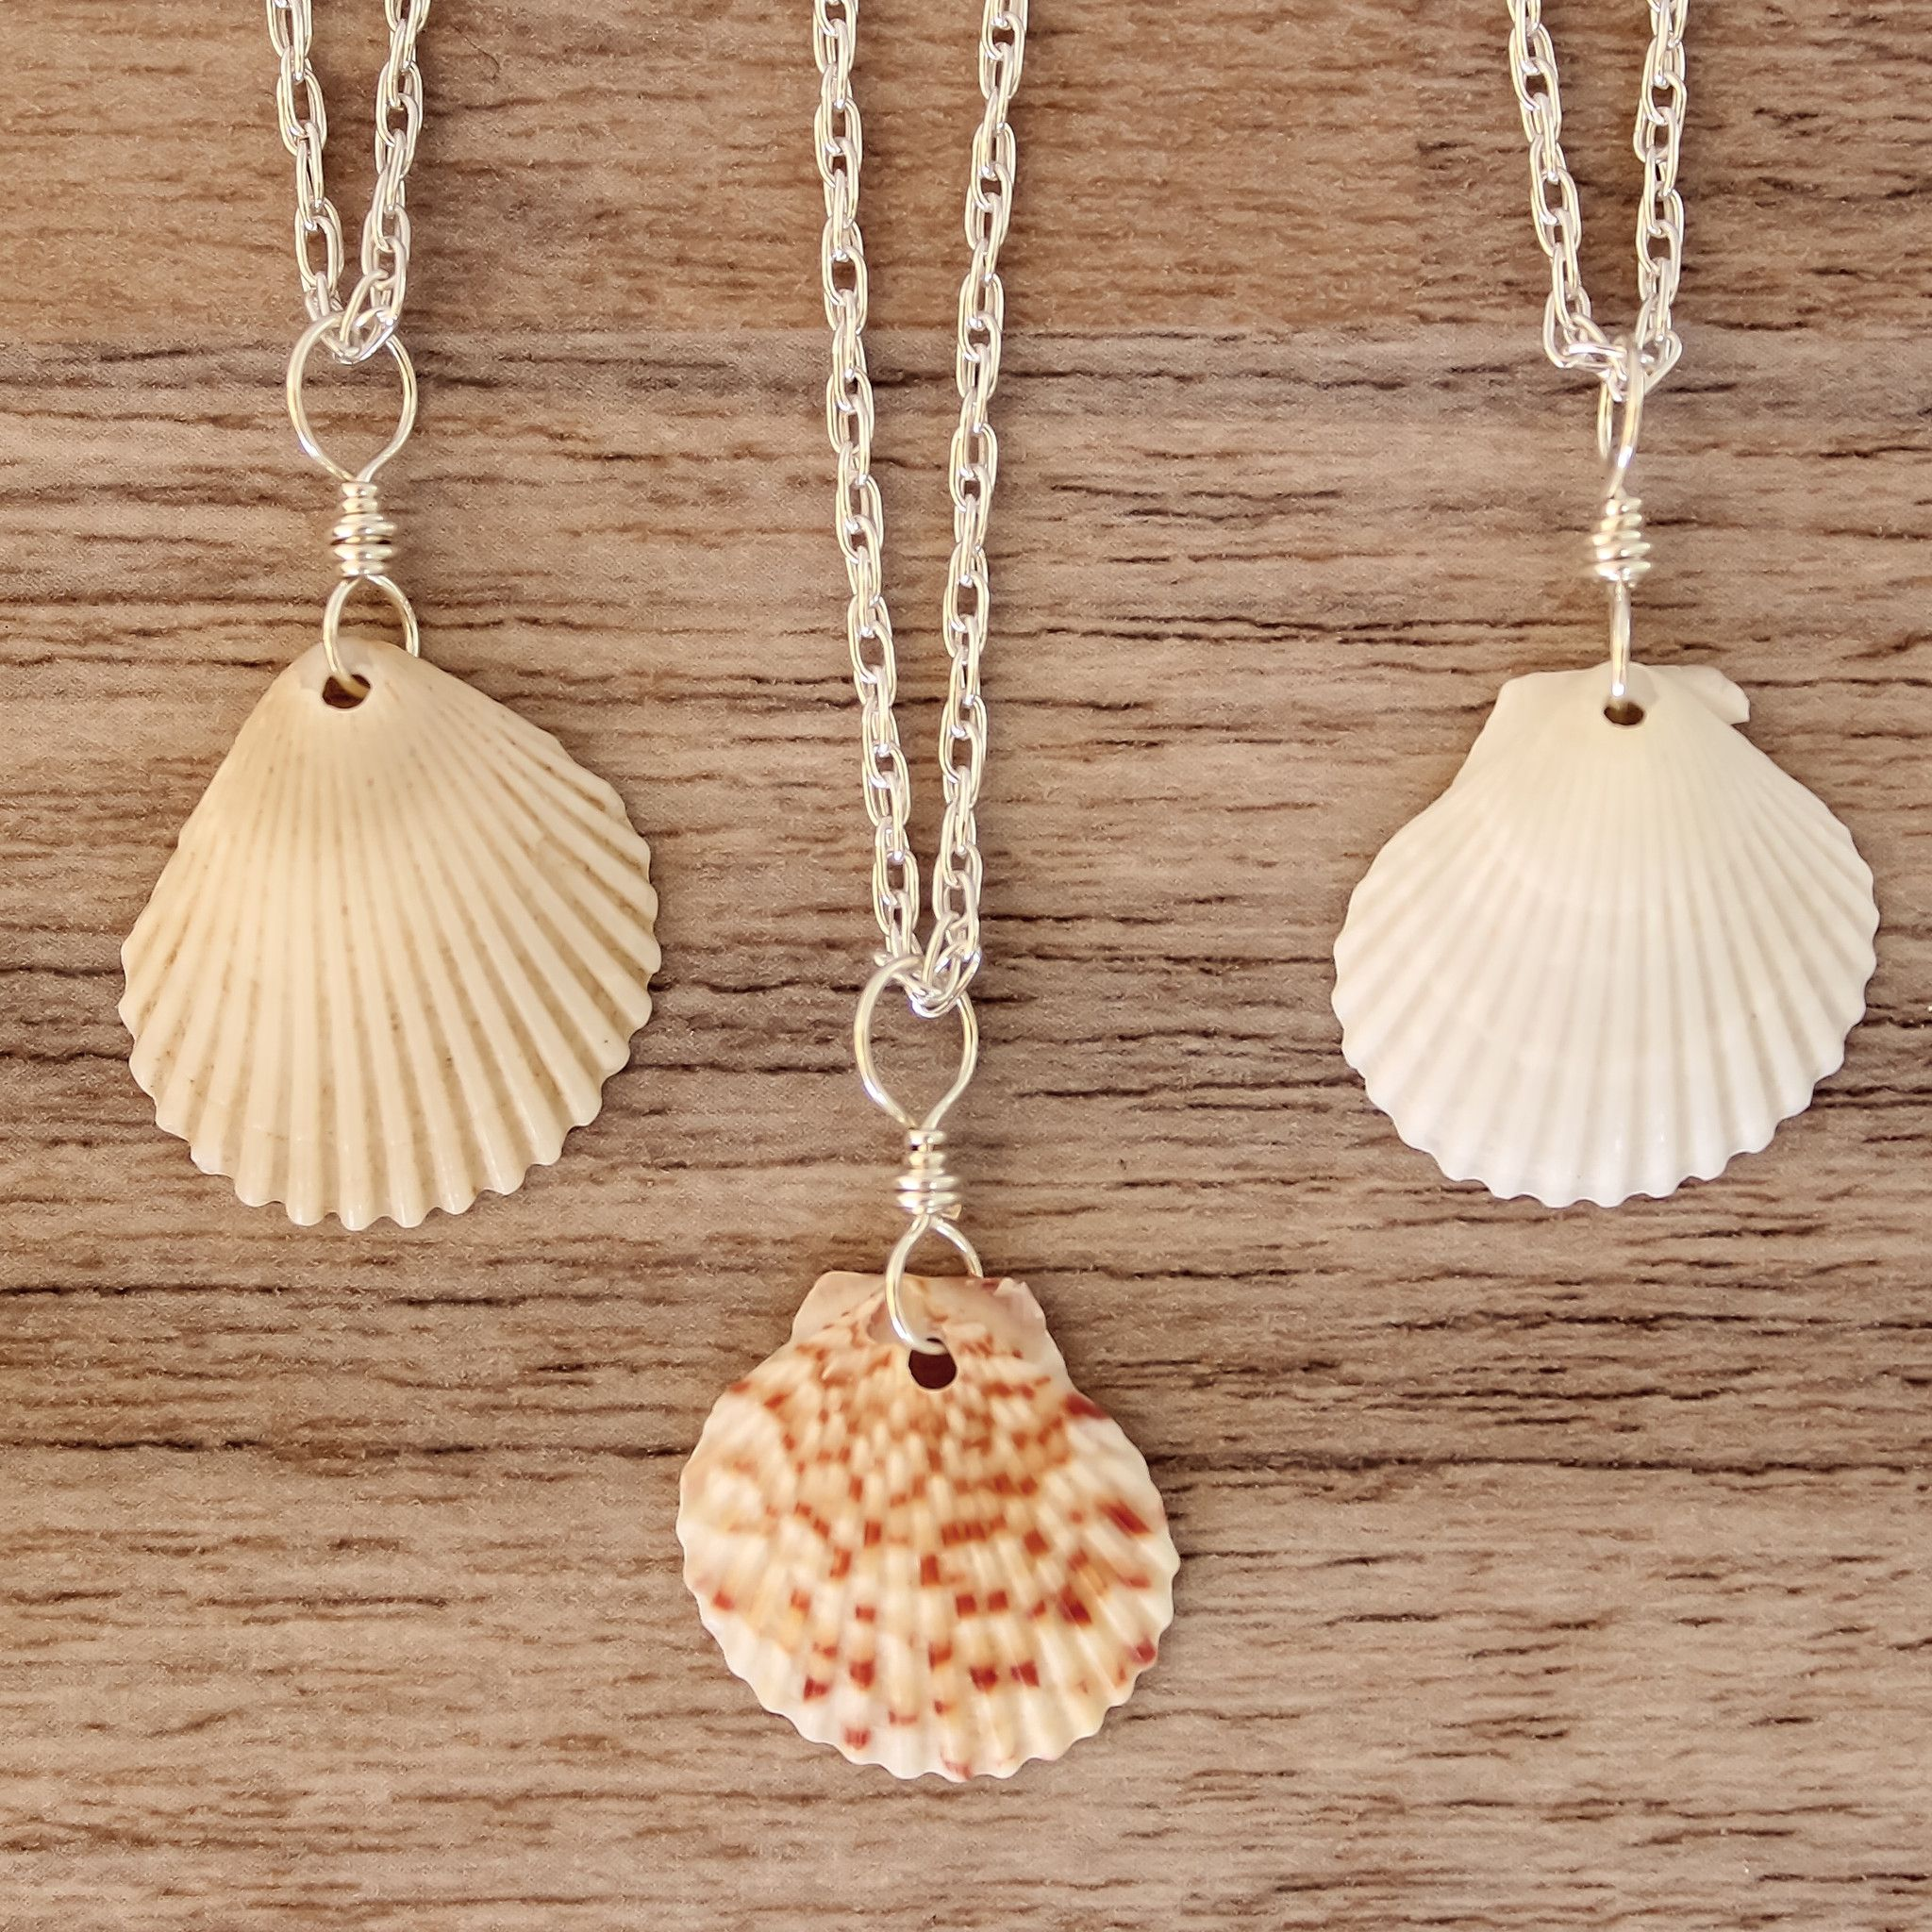 Make Your Own Seashell Jewelry: Hawaiian Sunrise Sea Shell Necklace